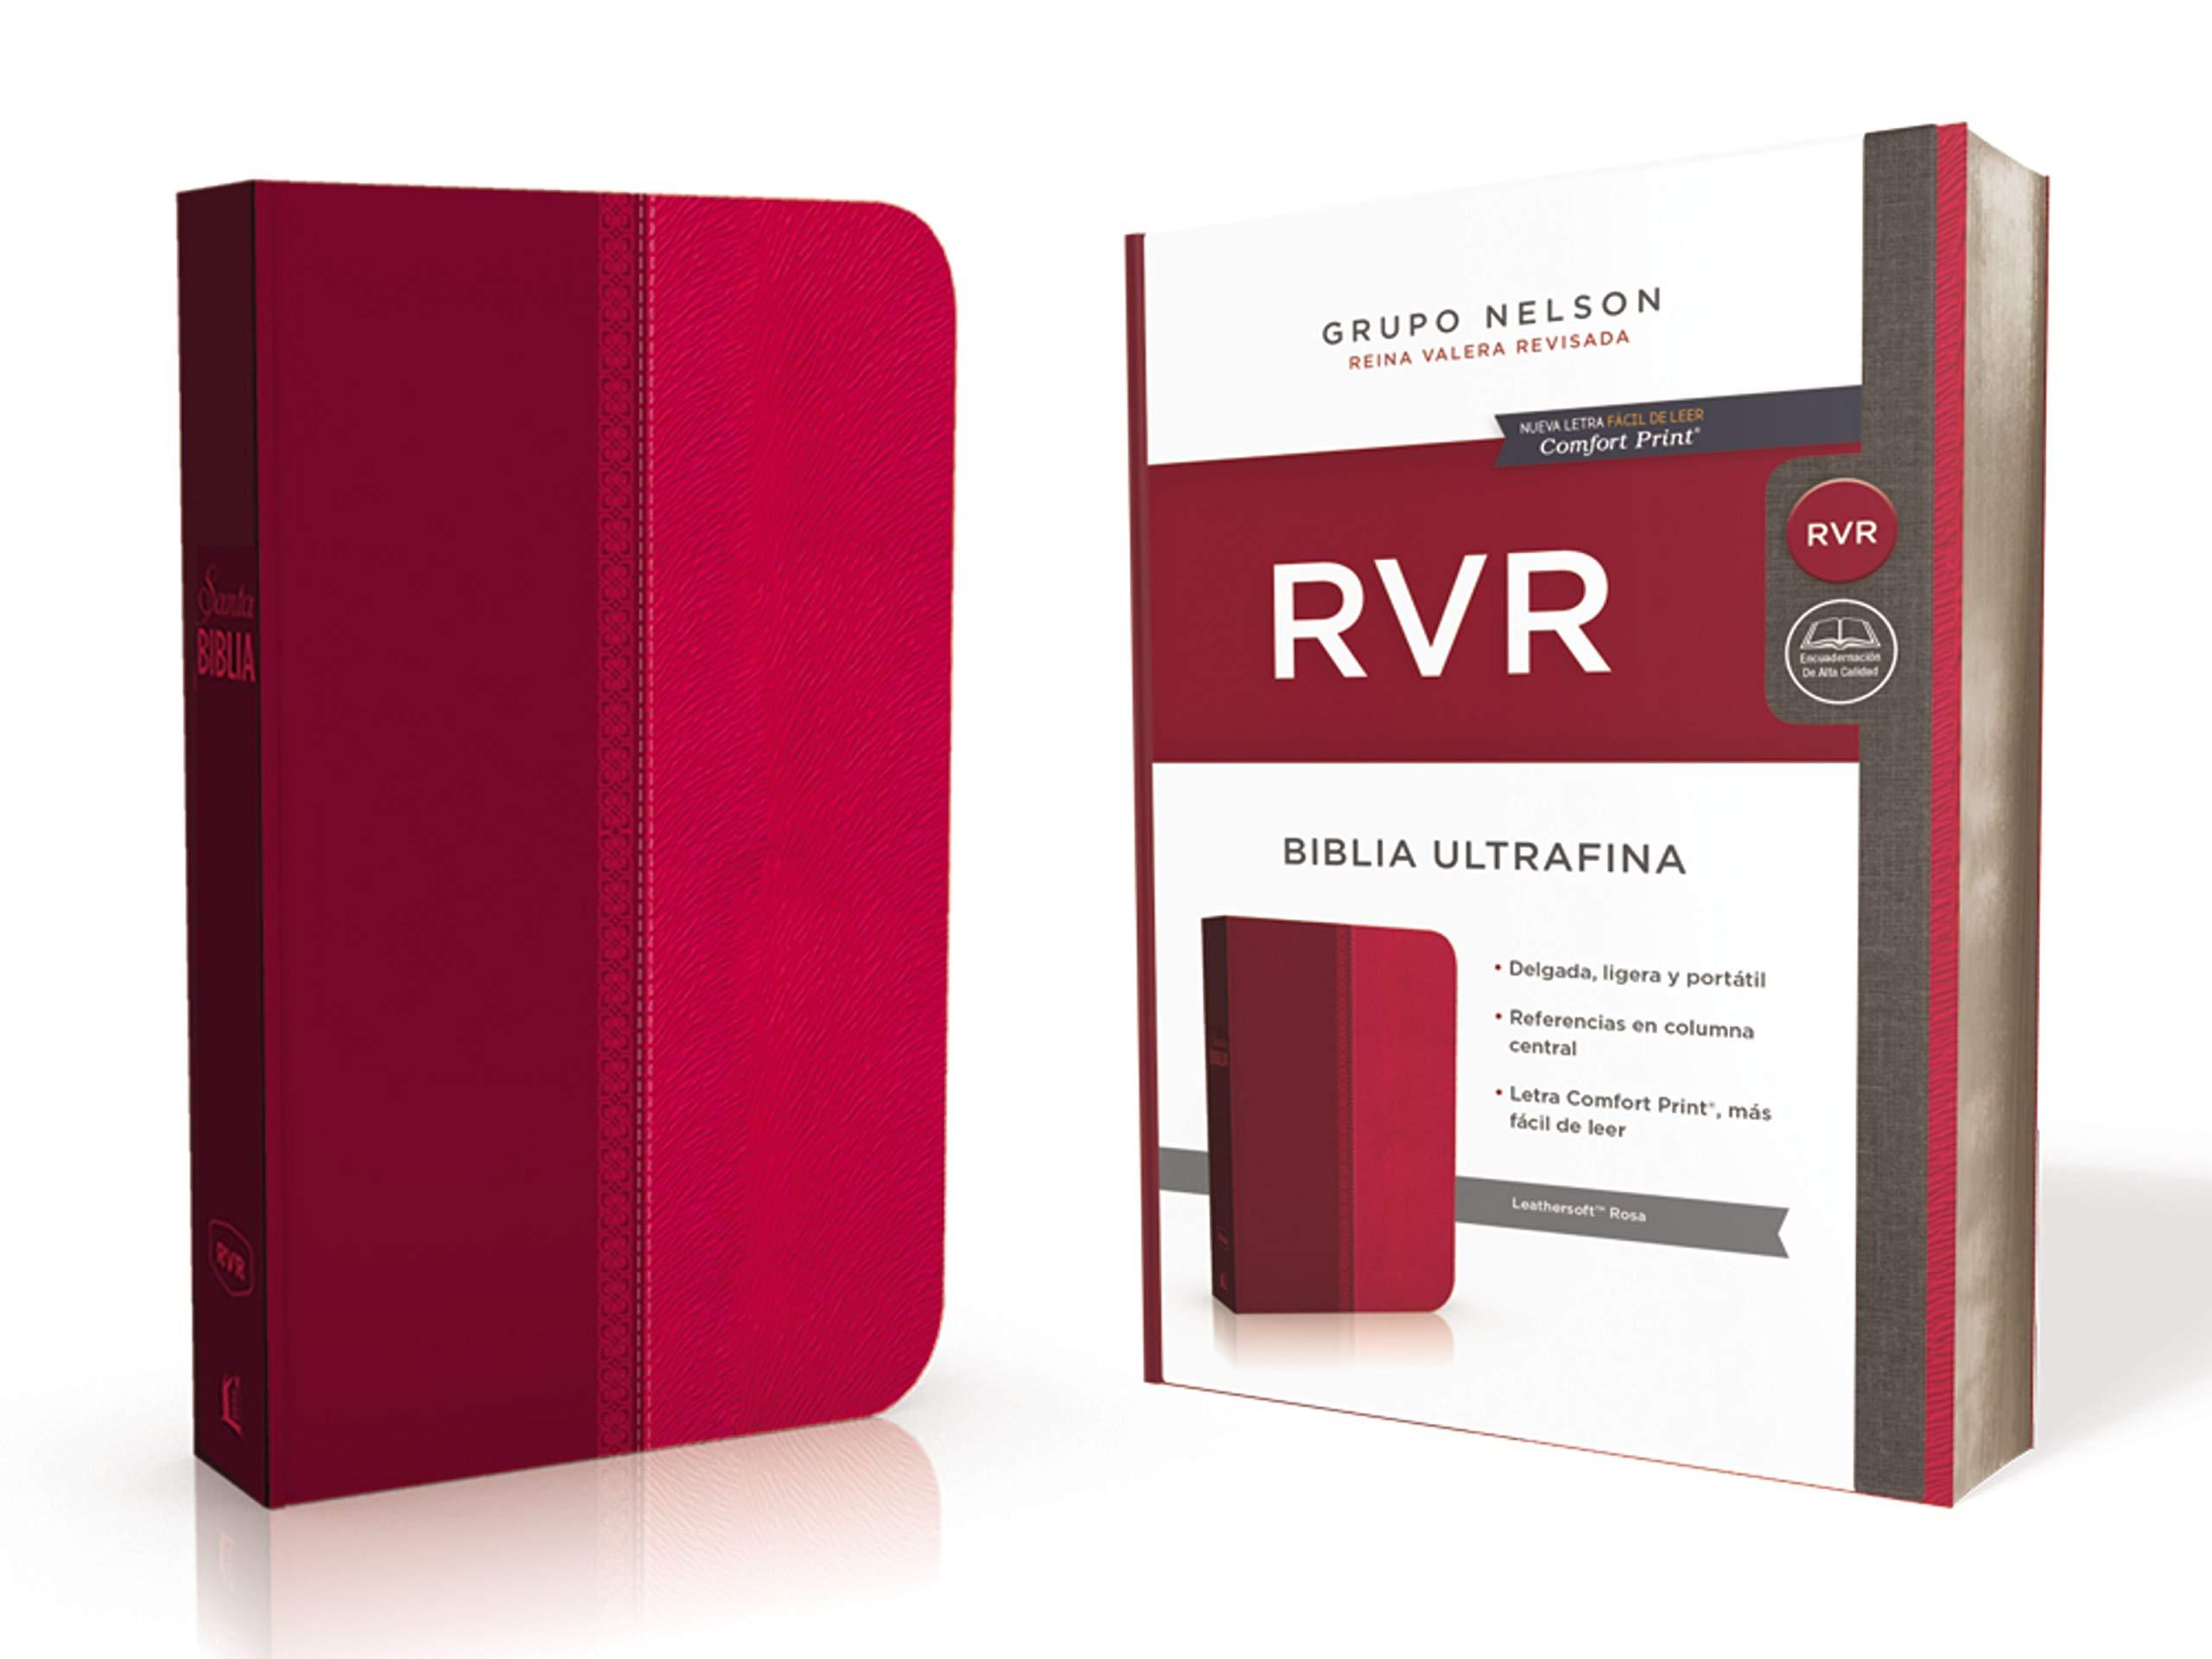 Santa Biblia Reina Valera Revisada (RVR) Ultrafina, Rosa (Spanish Edition): Reina Valera Revisada: 9781400210824: Amazon.com: Books